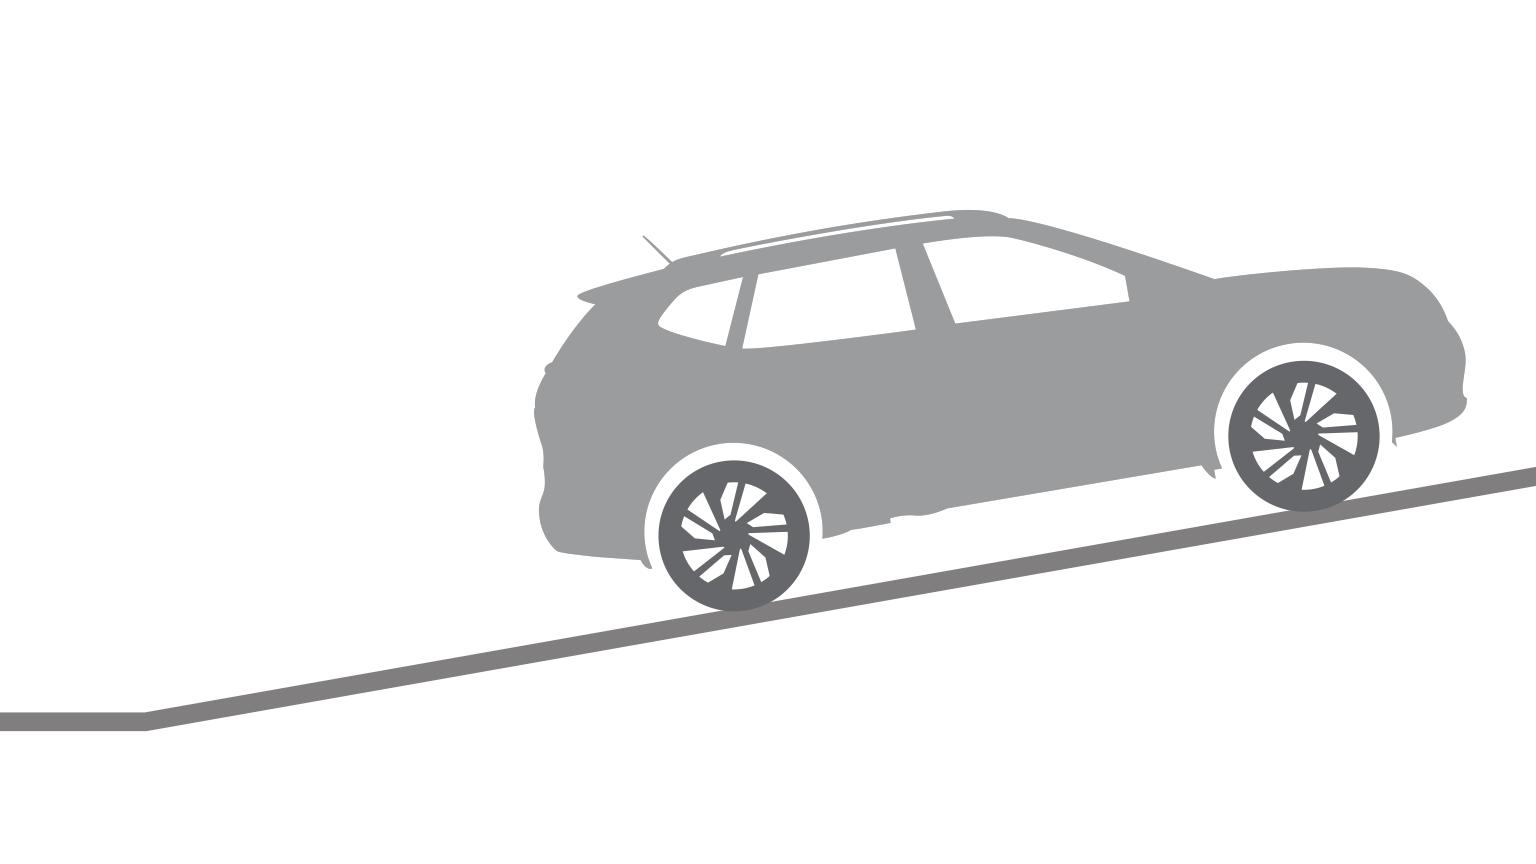 7 Seater Amp 4x4 Car Performance